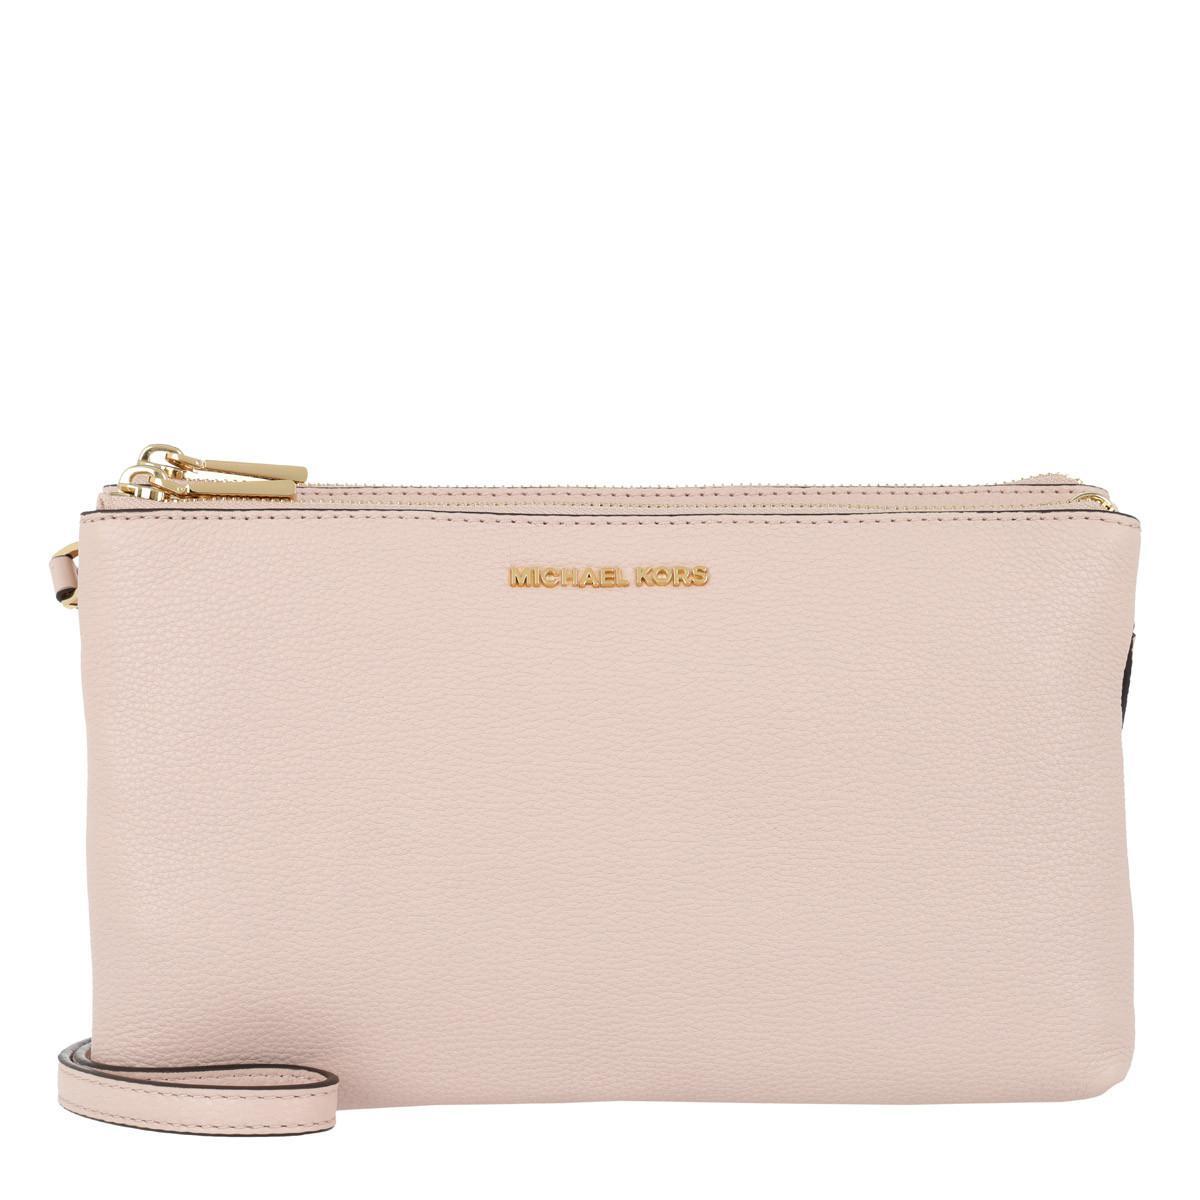 Michael Kors Double Zipper Crossbody Bag Soft Pink in Pink - Lyst 322609f824323